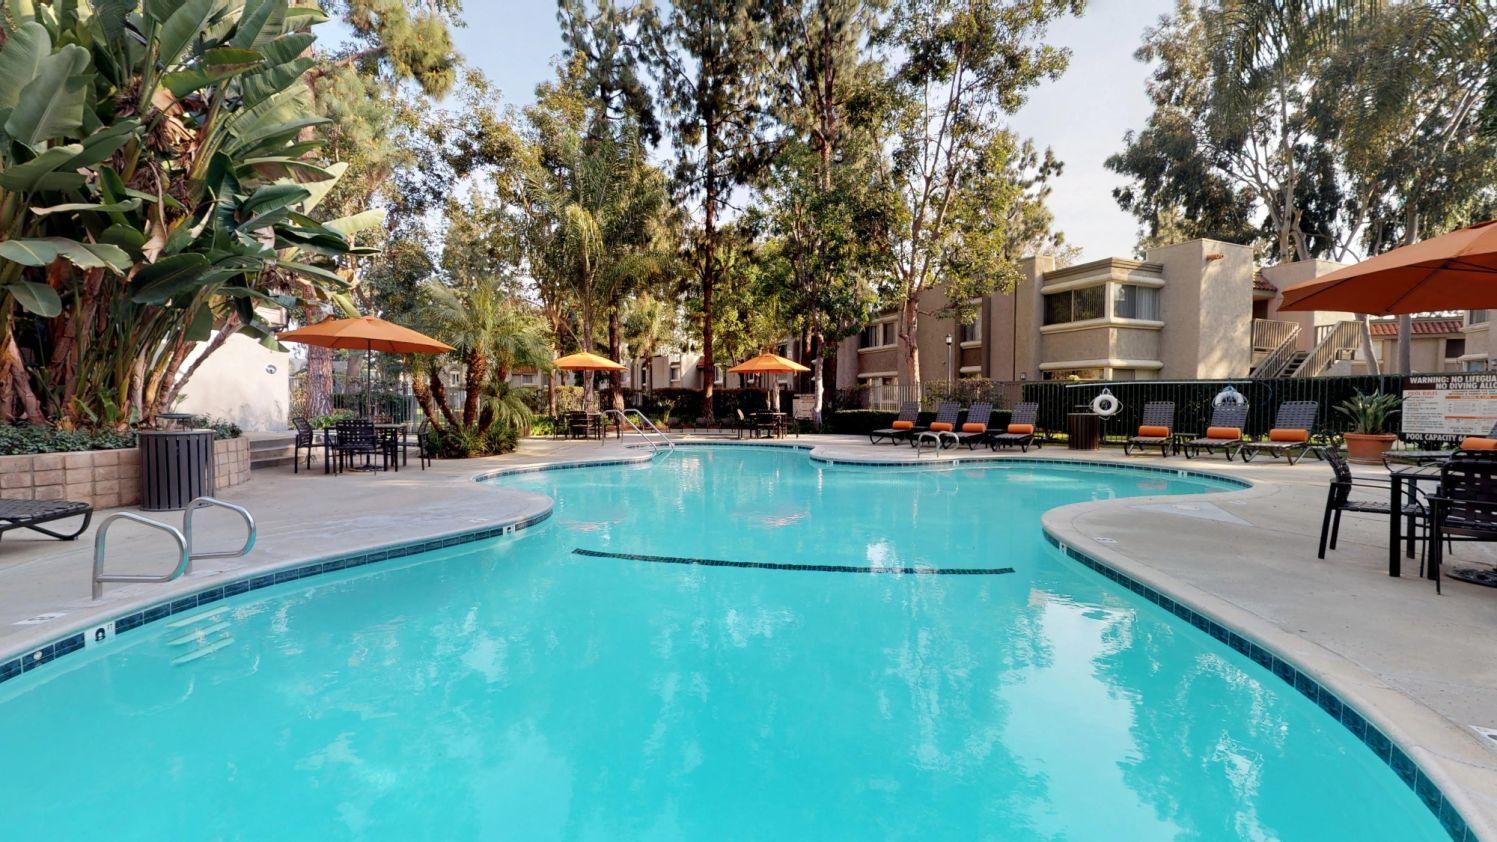 Mountain View Short Term - Sample Image of San Dimas CA Temporary Housing